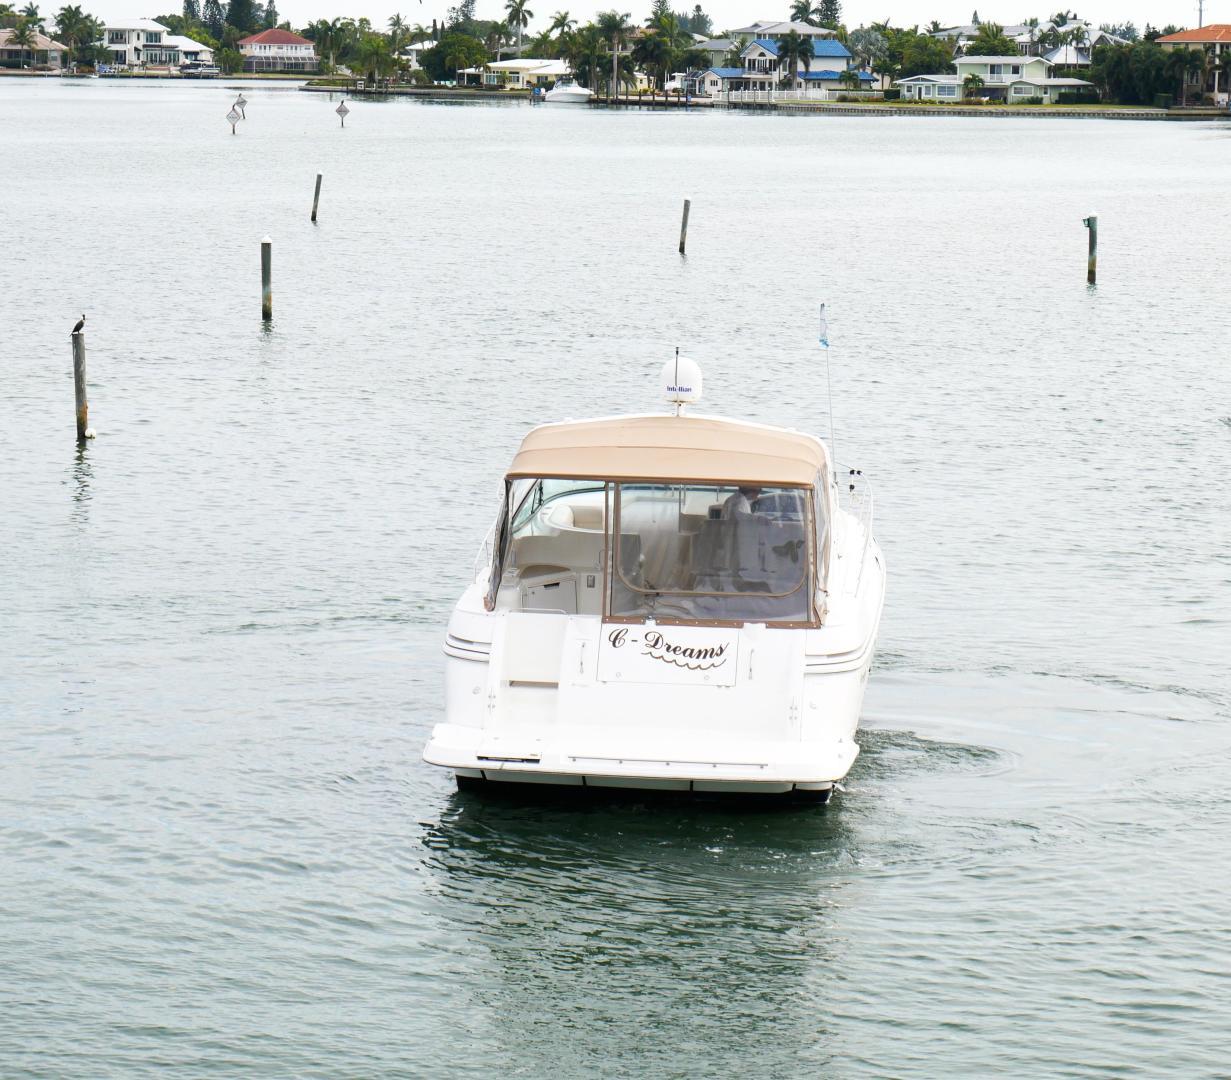 Cruisers-3870 Express 2000-CDreams Destin-Florida-United States-2000 38 Cruisers CDreams Transom-716053 | Thumbnail